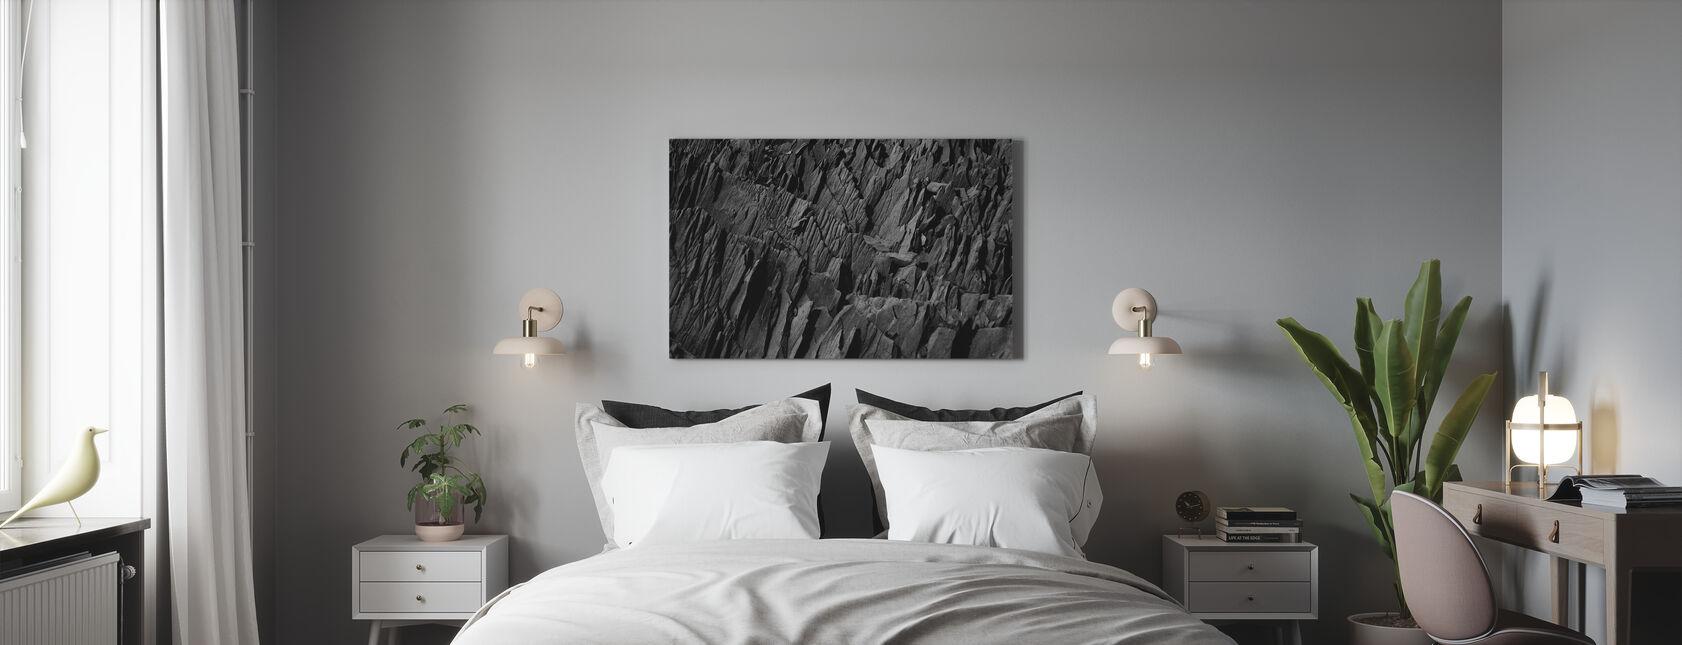 Meißel Felsen - Leinwandbild - Schlafzimmer